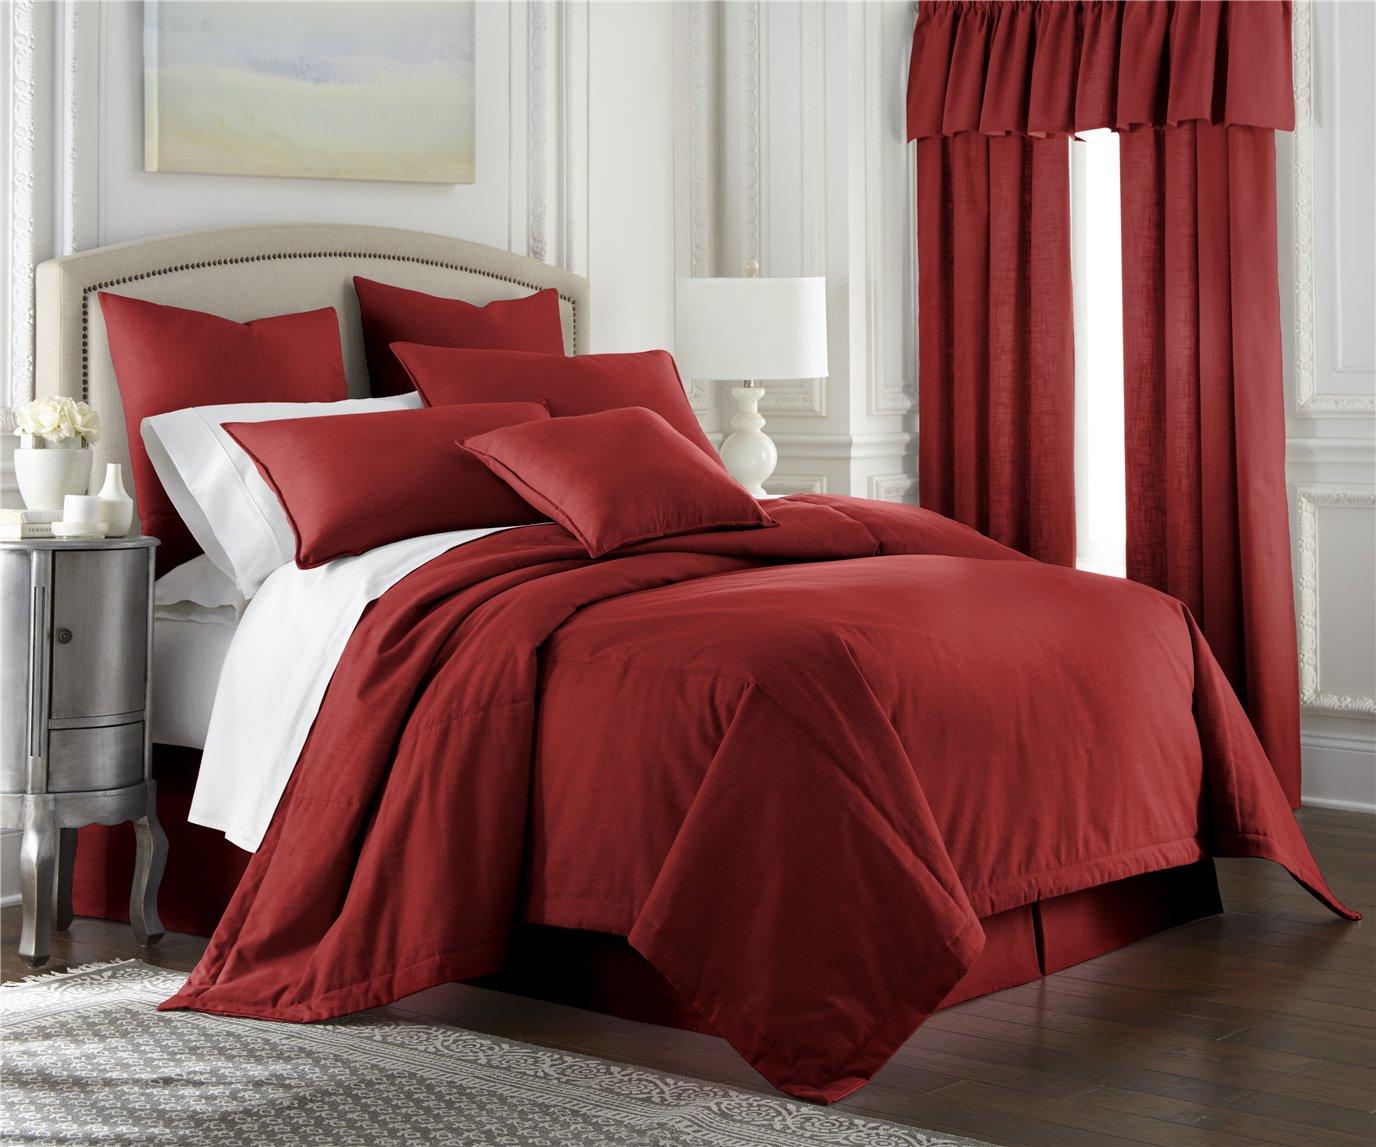 Cambric Red Comforter Super Queen